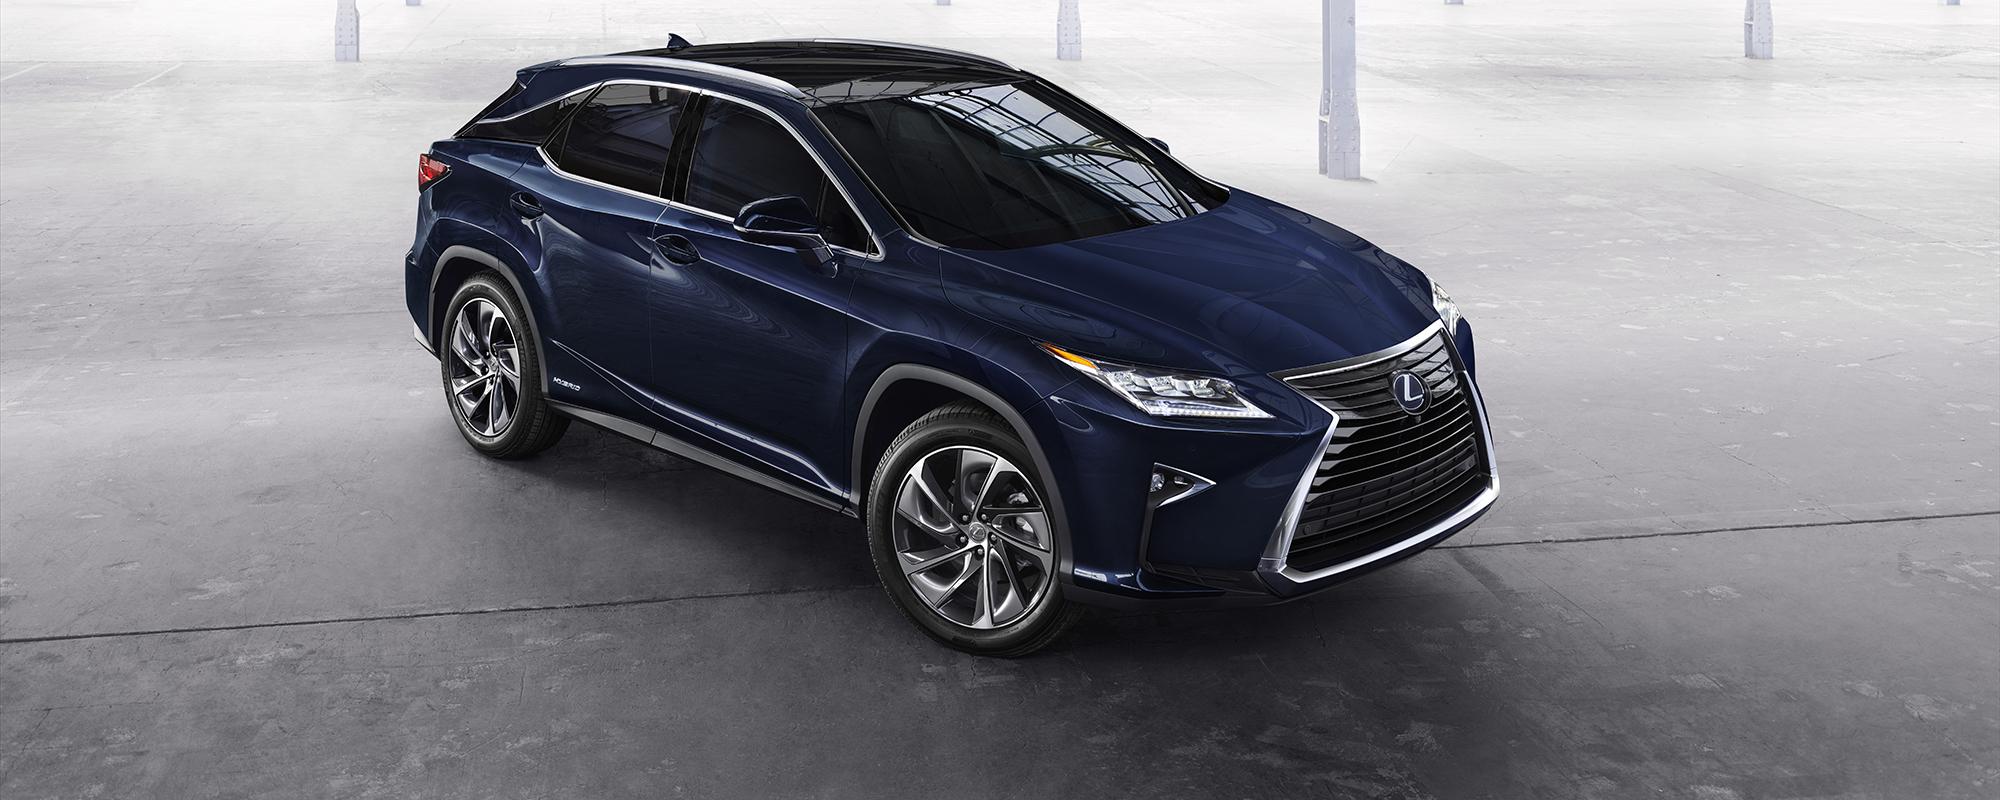 Nieuwe Lexus RX onthuld in New York